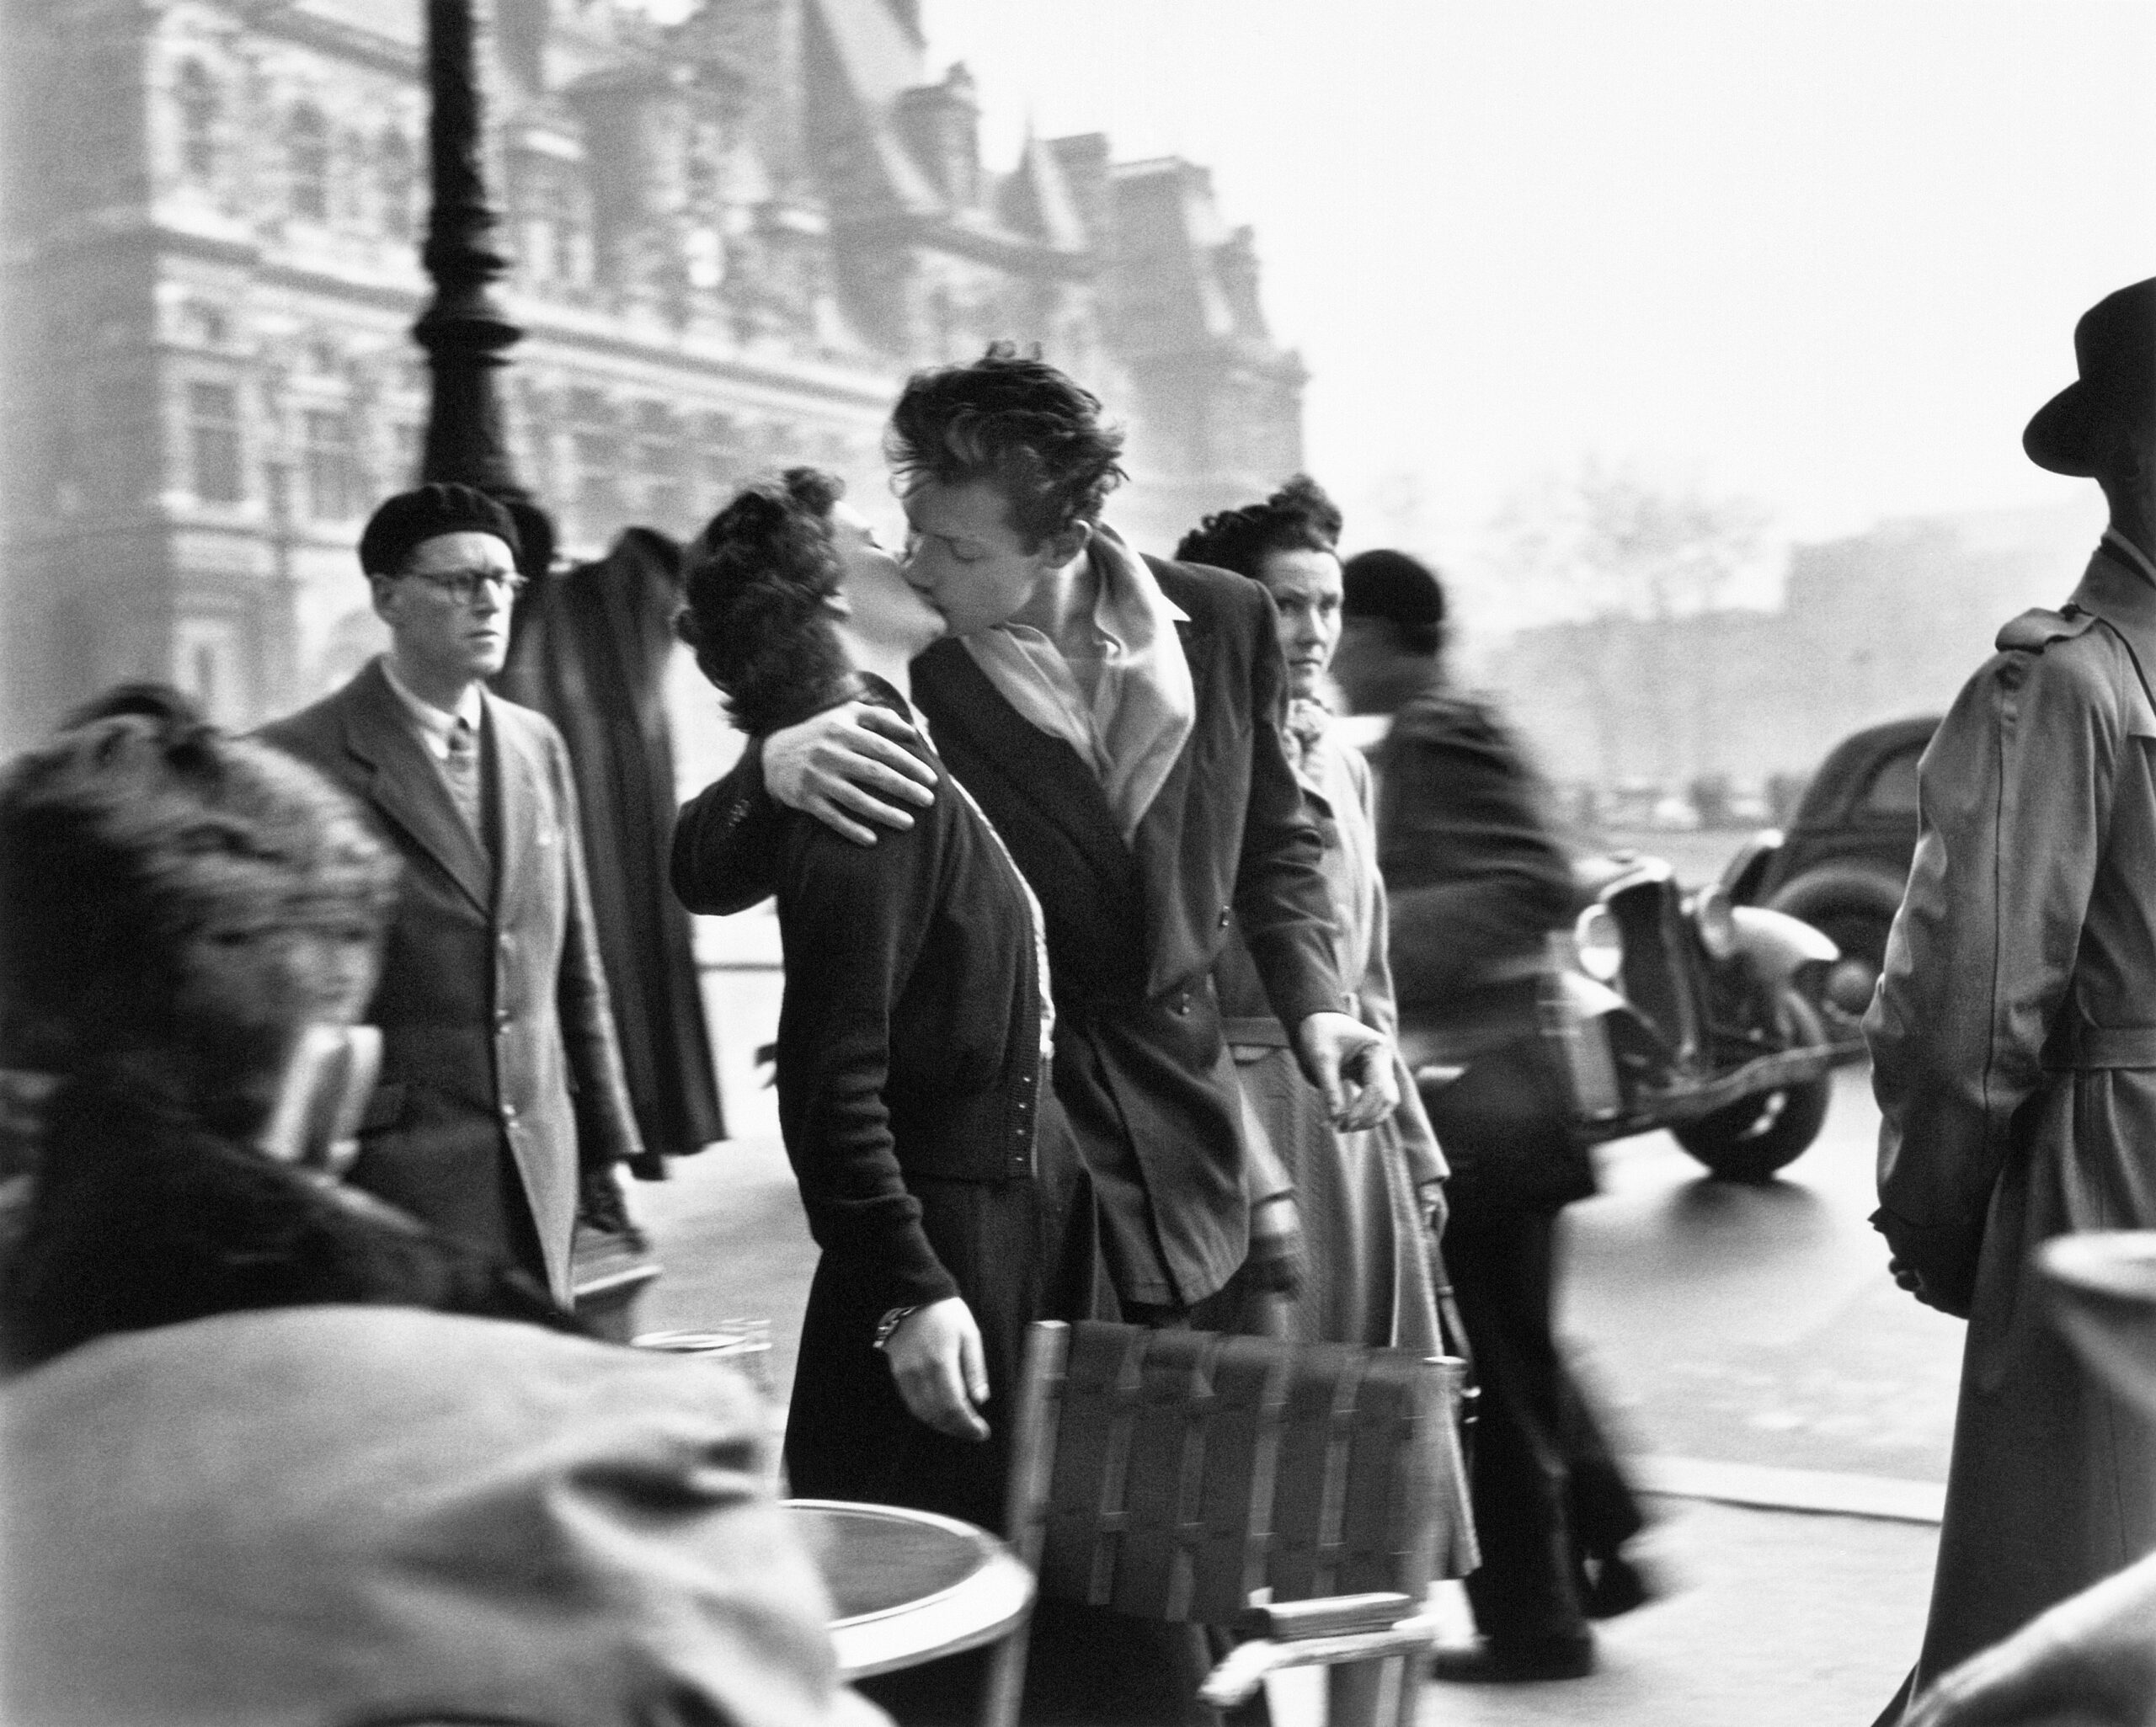 Momenti di grazia ed espressioni di felicità, le fotografie di Robert Doisneau a Rovigo